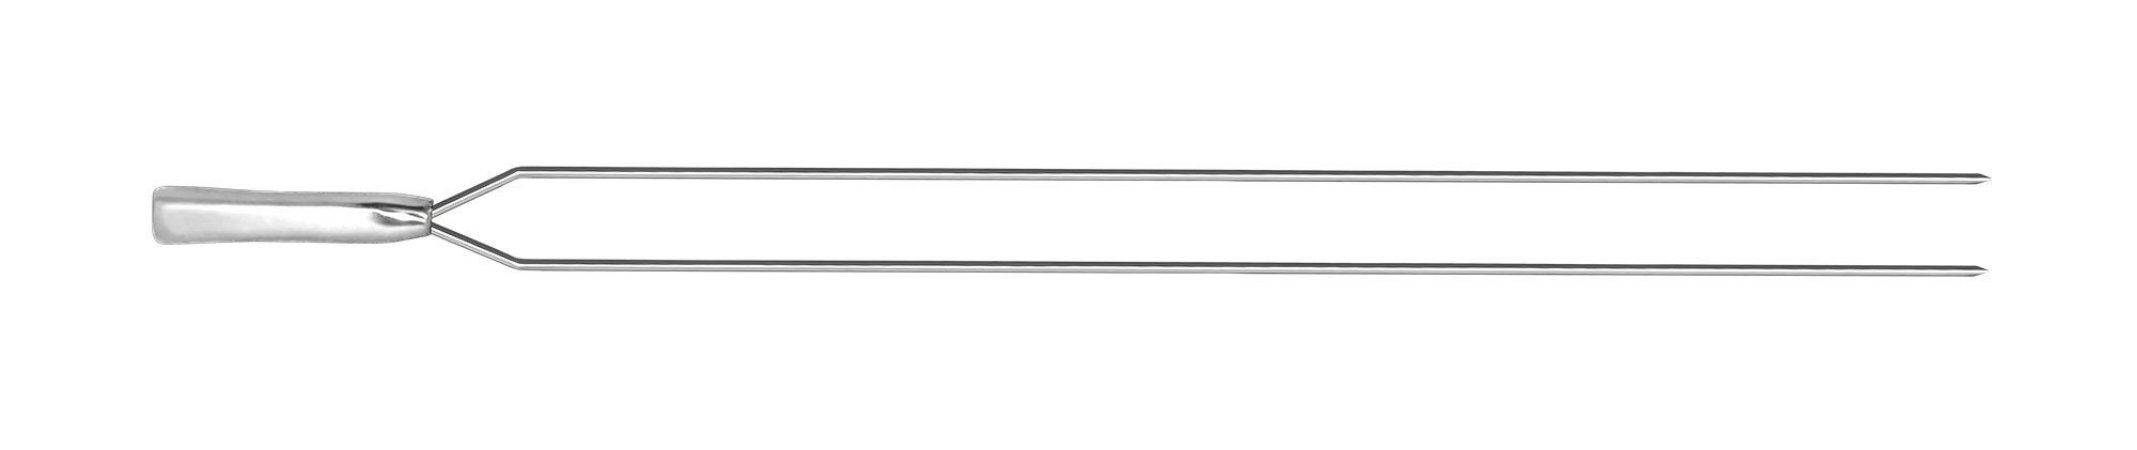 Espeto Inox Duplo Cabo Fundido 104 cm x 6 mm